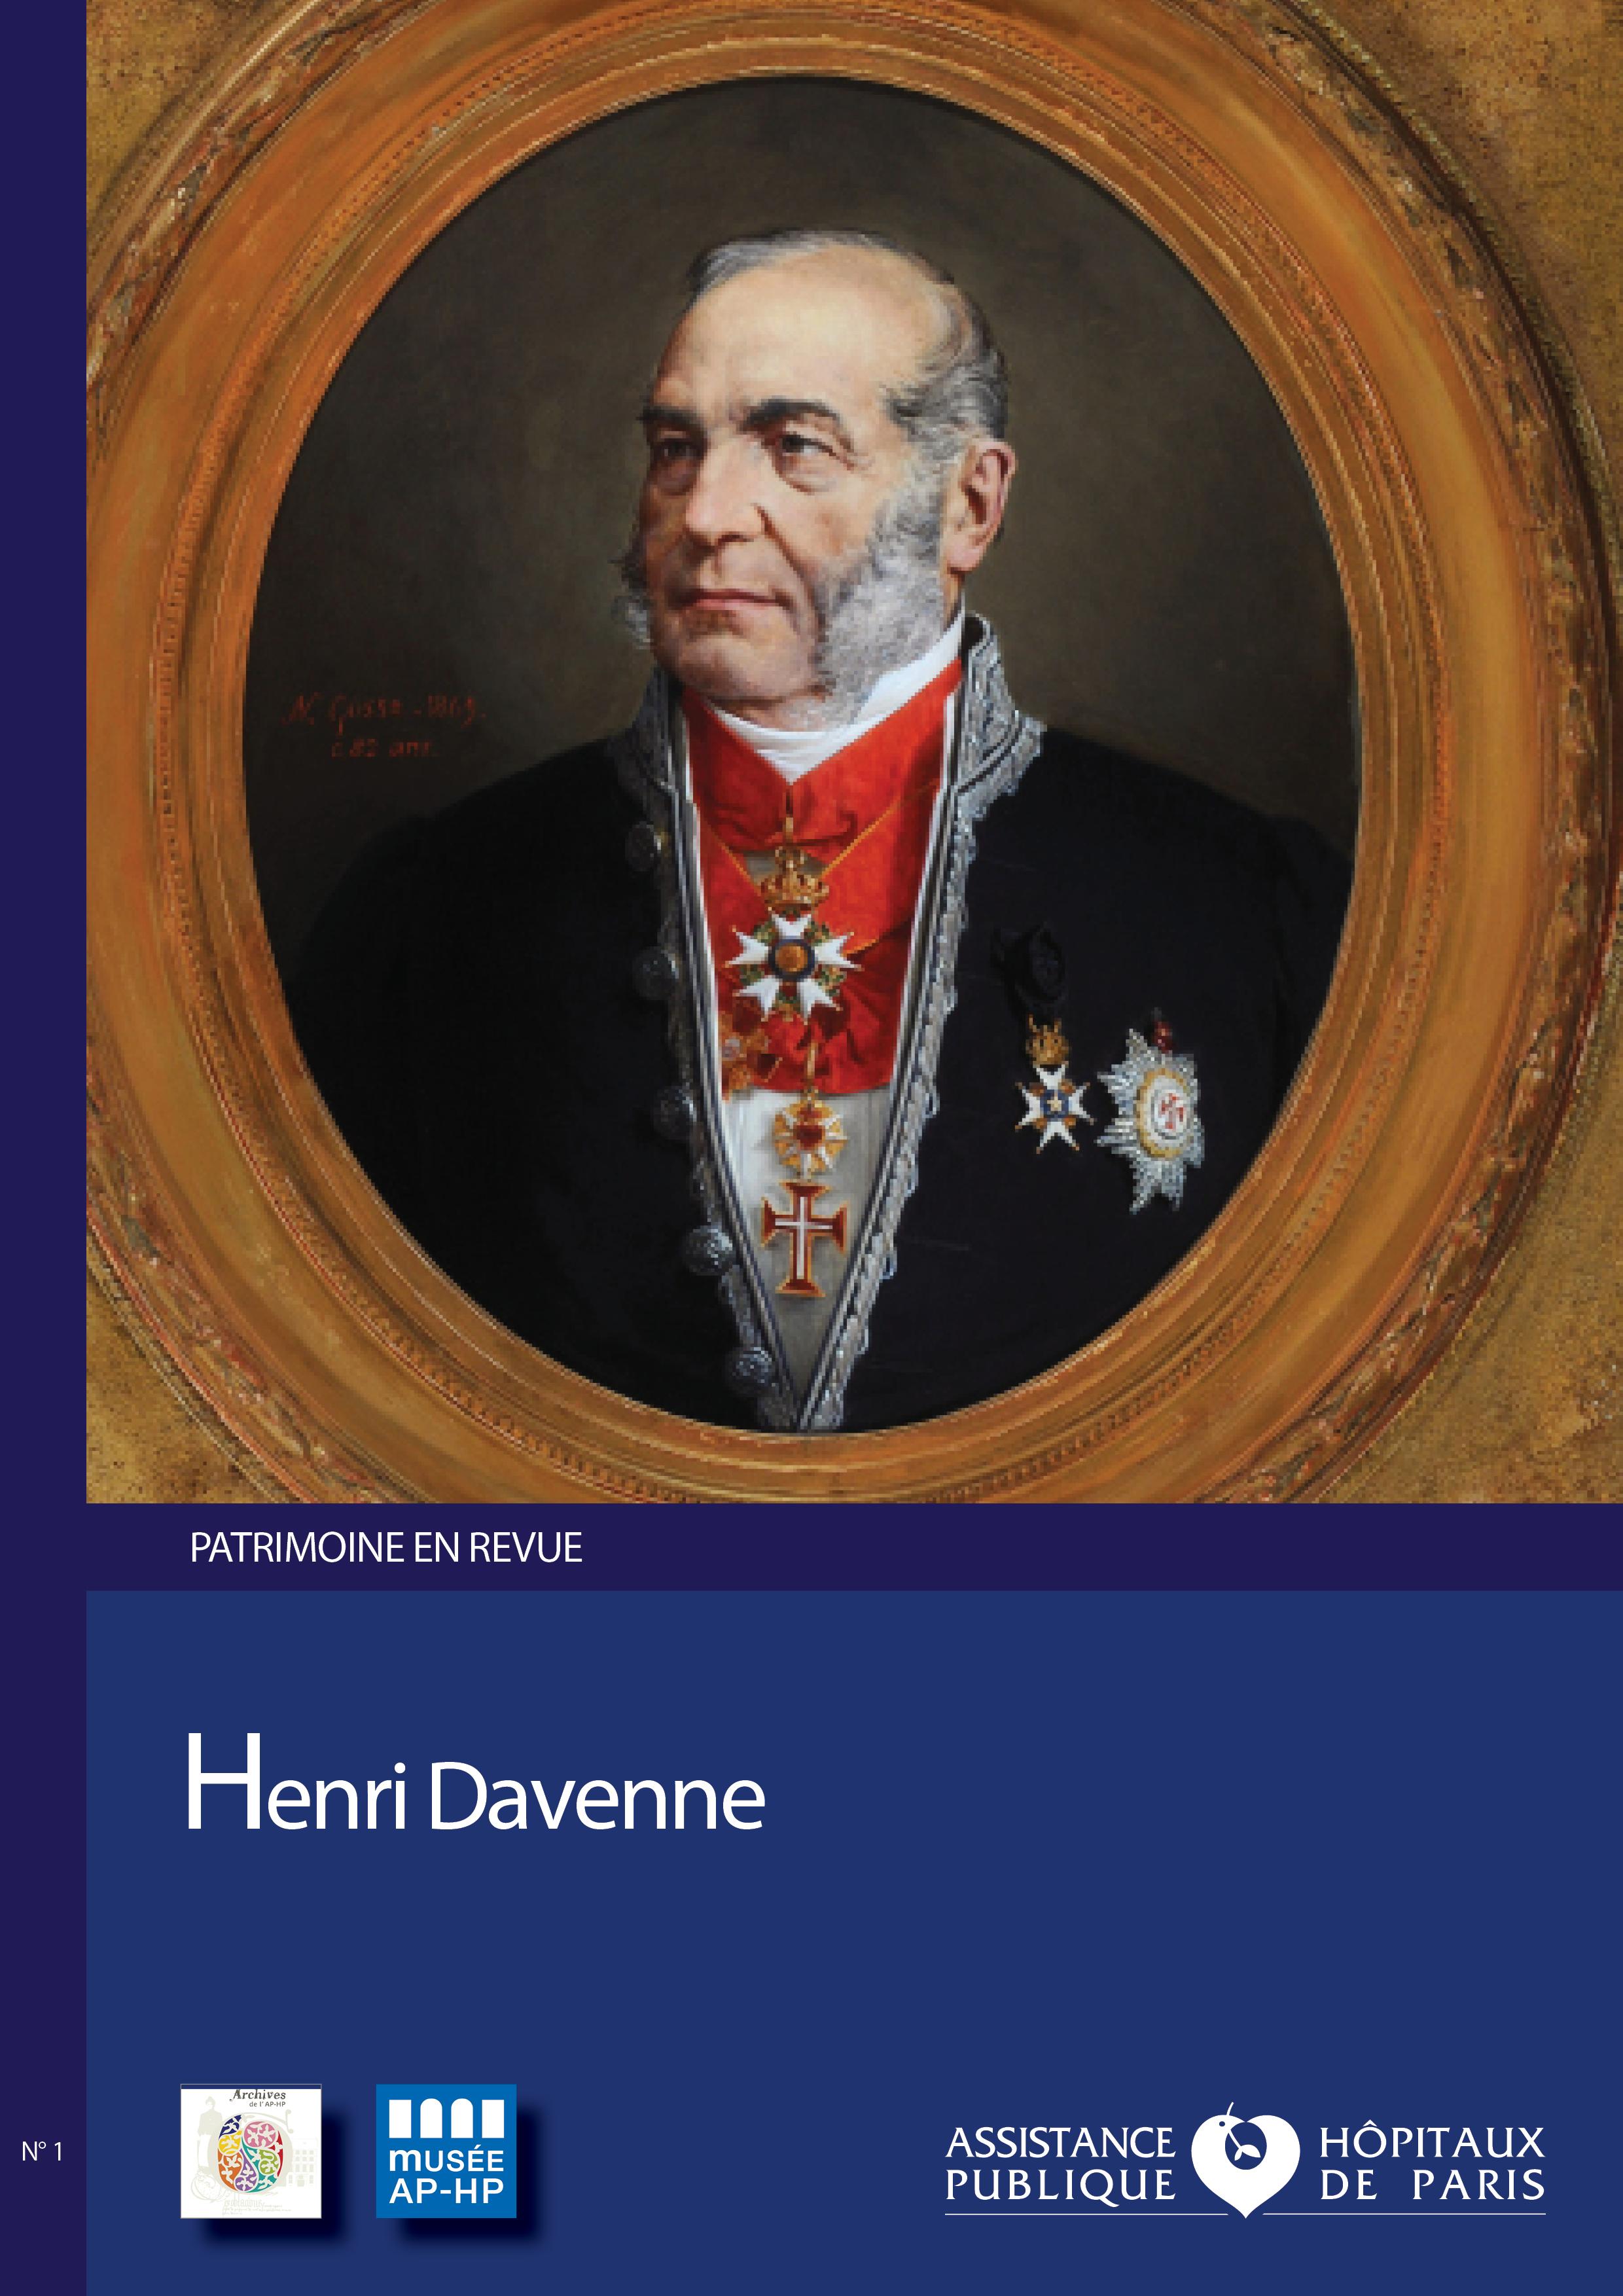 Patrimoine en revue, Henri Davenne